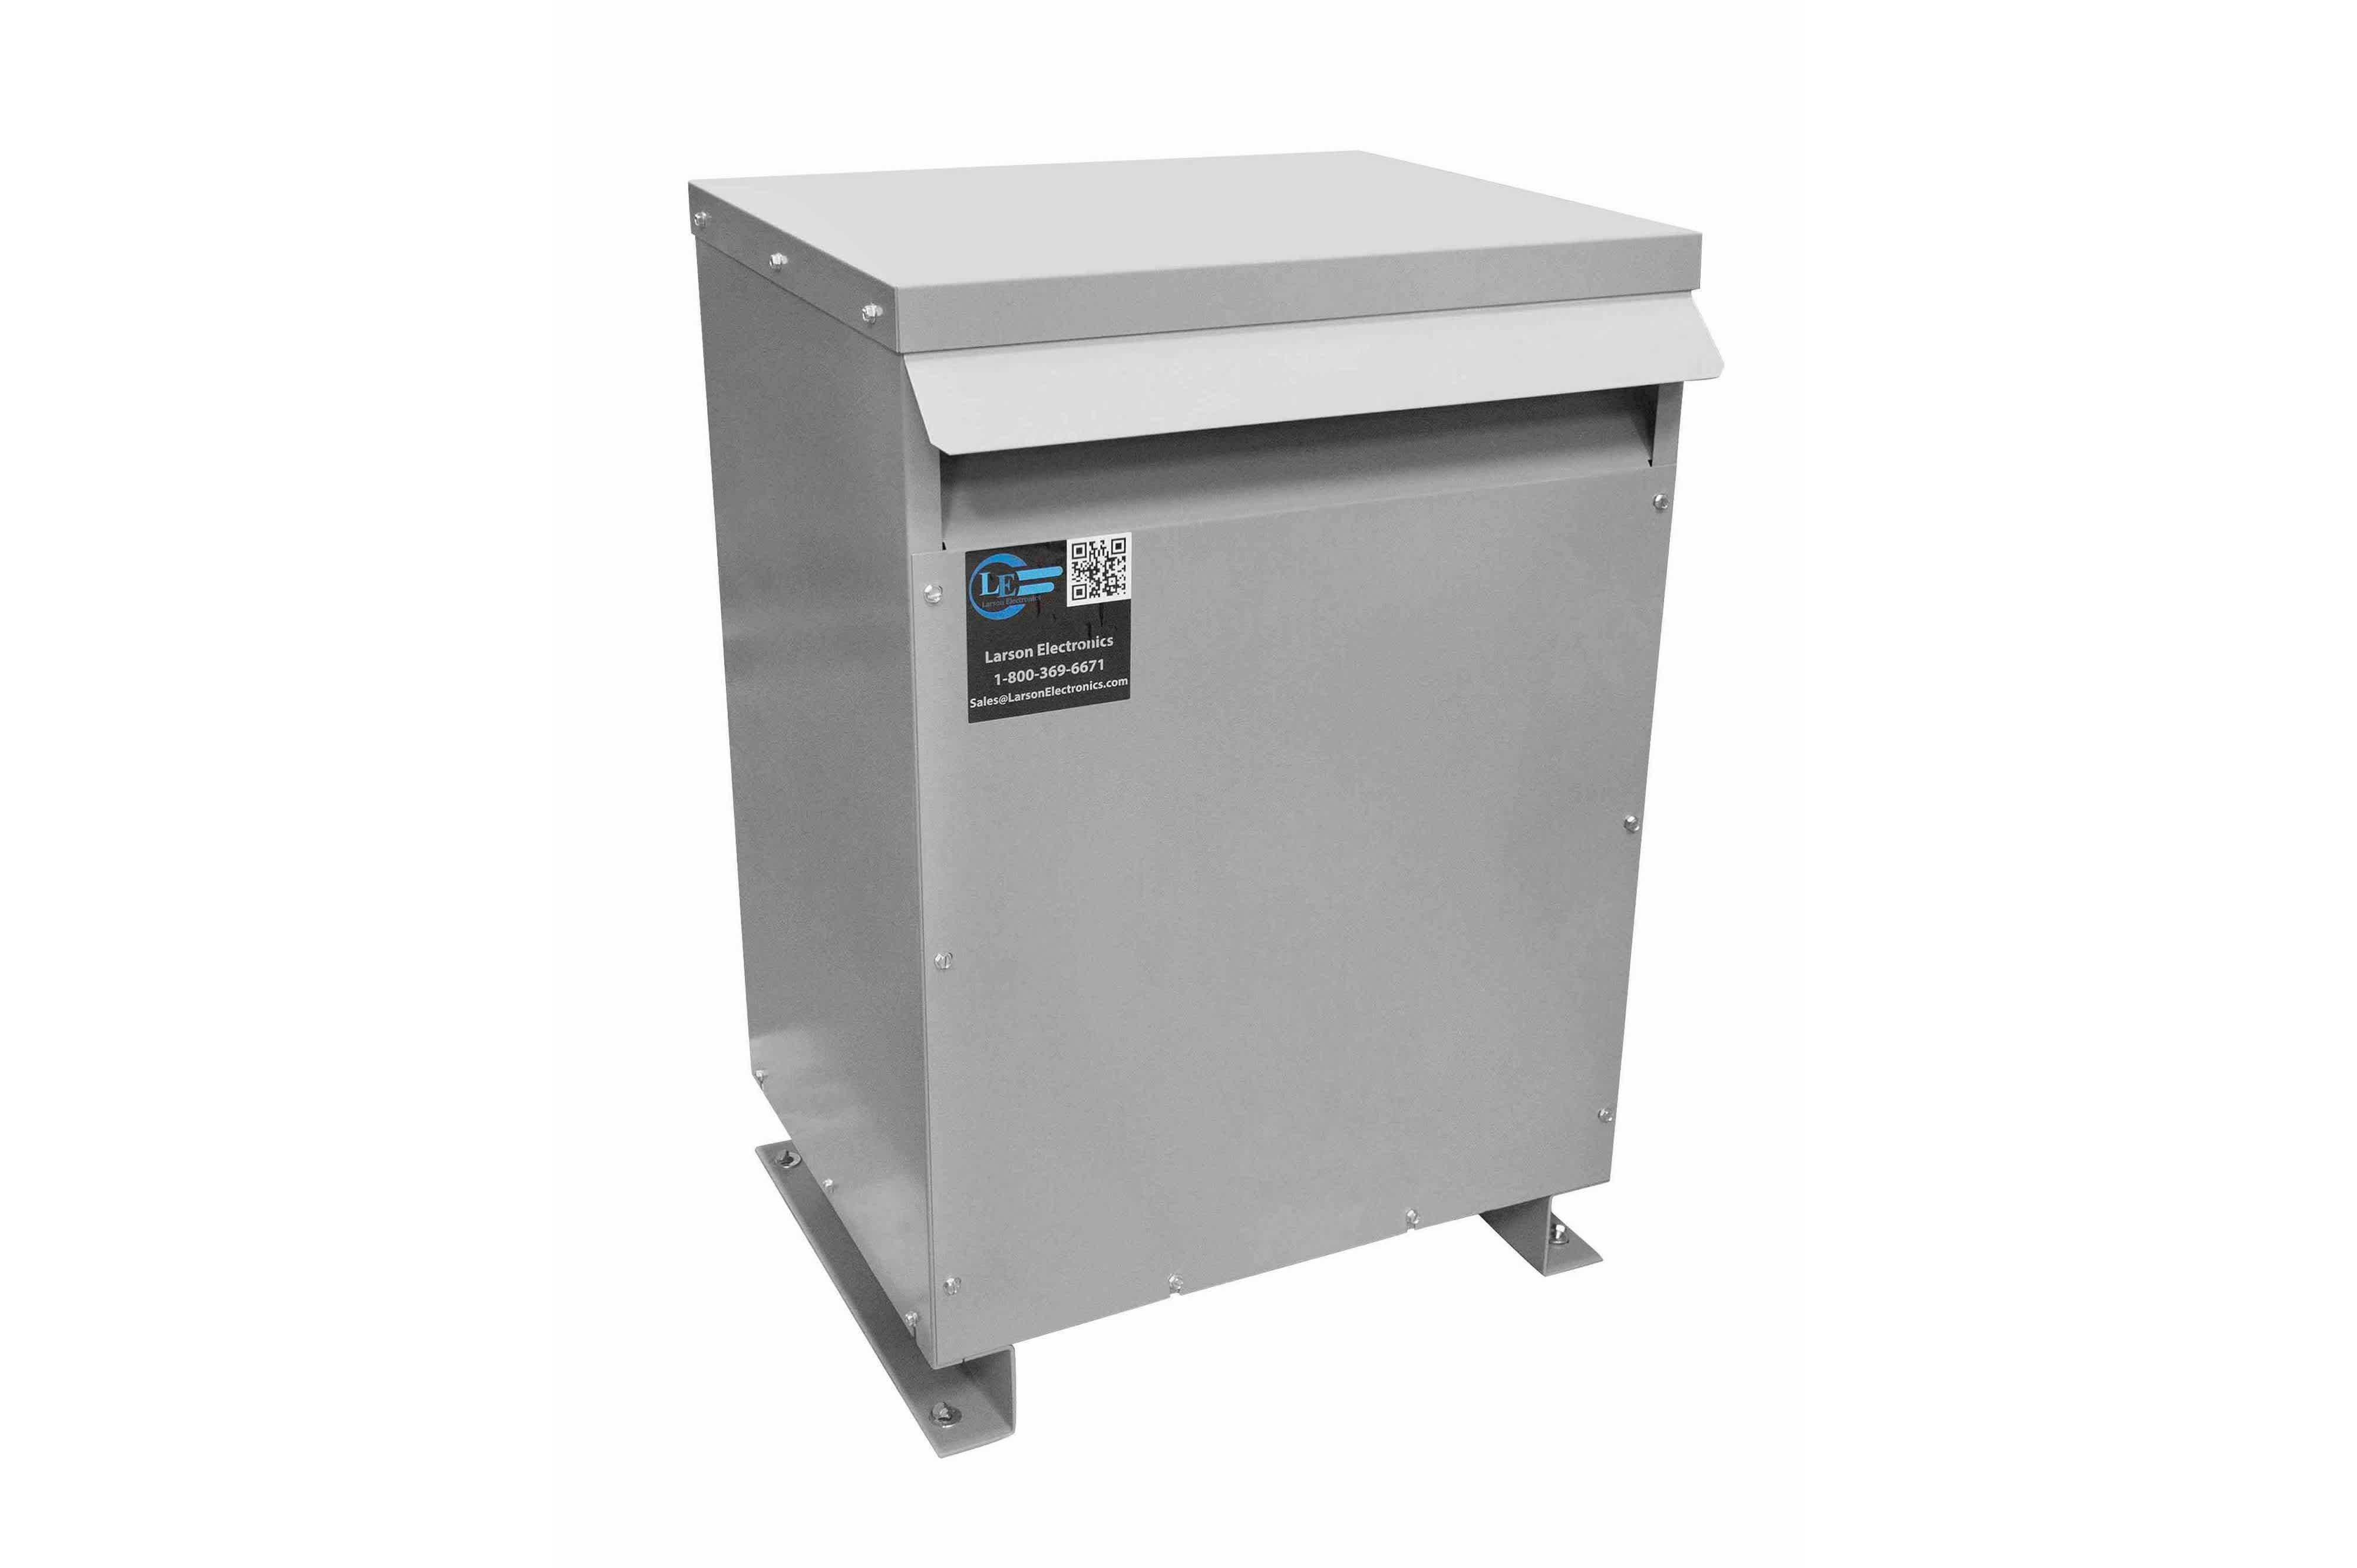 150 kVA 3PH DOE Transformer, 240V Delta Primary, 480Y/277 Wye-N Secondary, N3R, Ventilated, 60 Hz